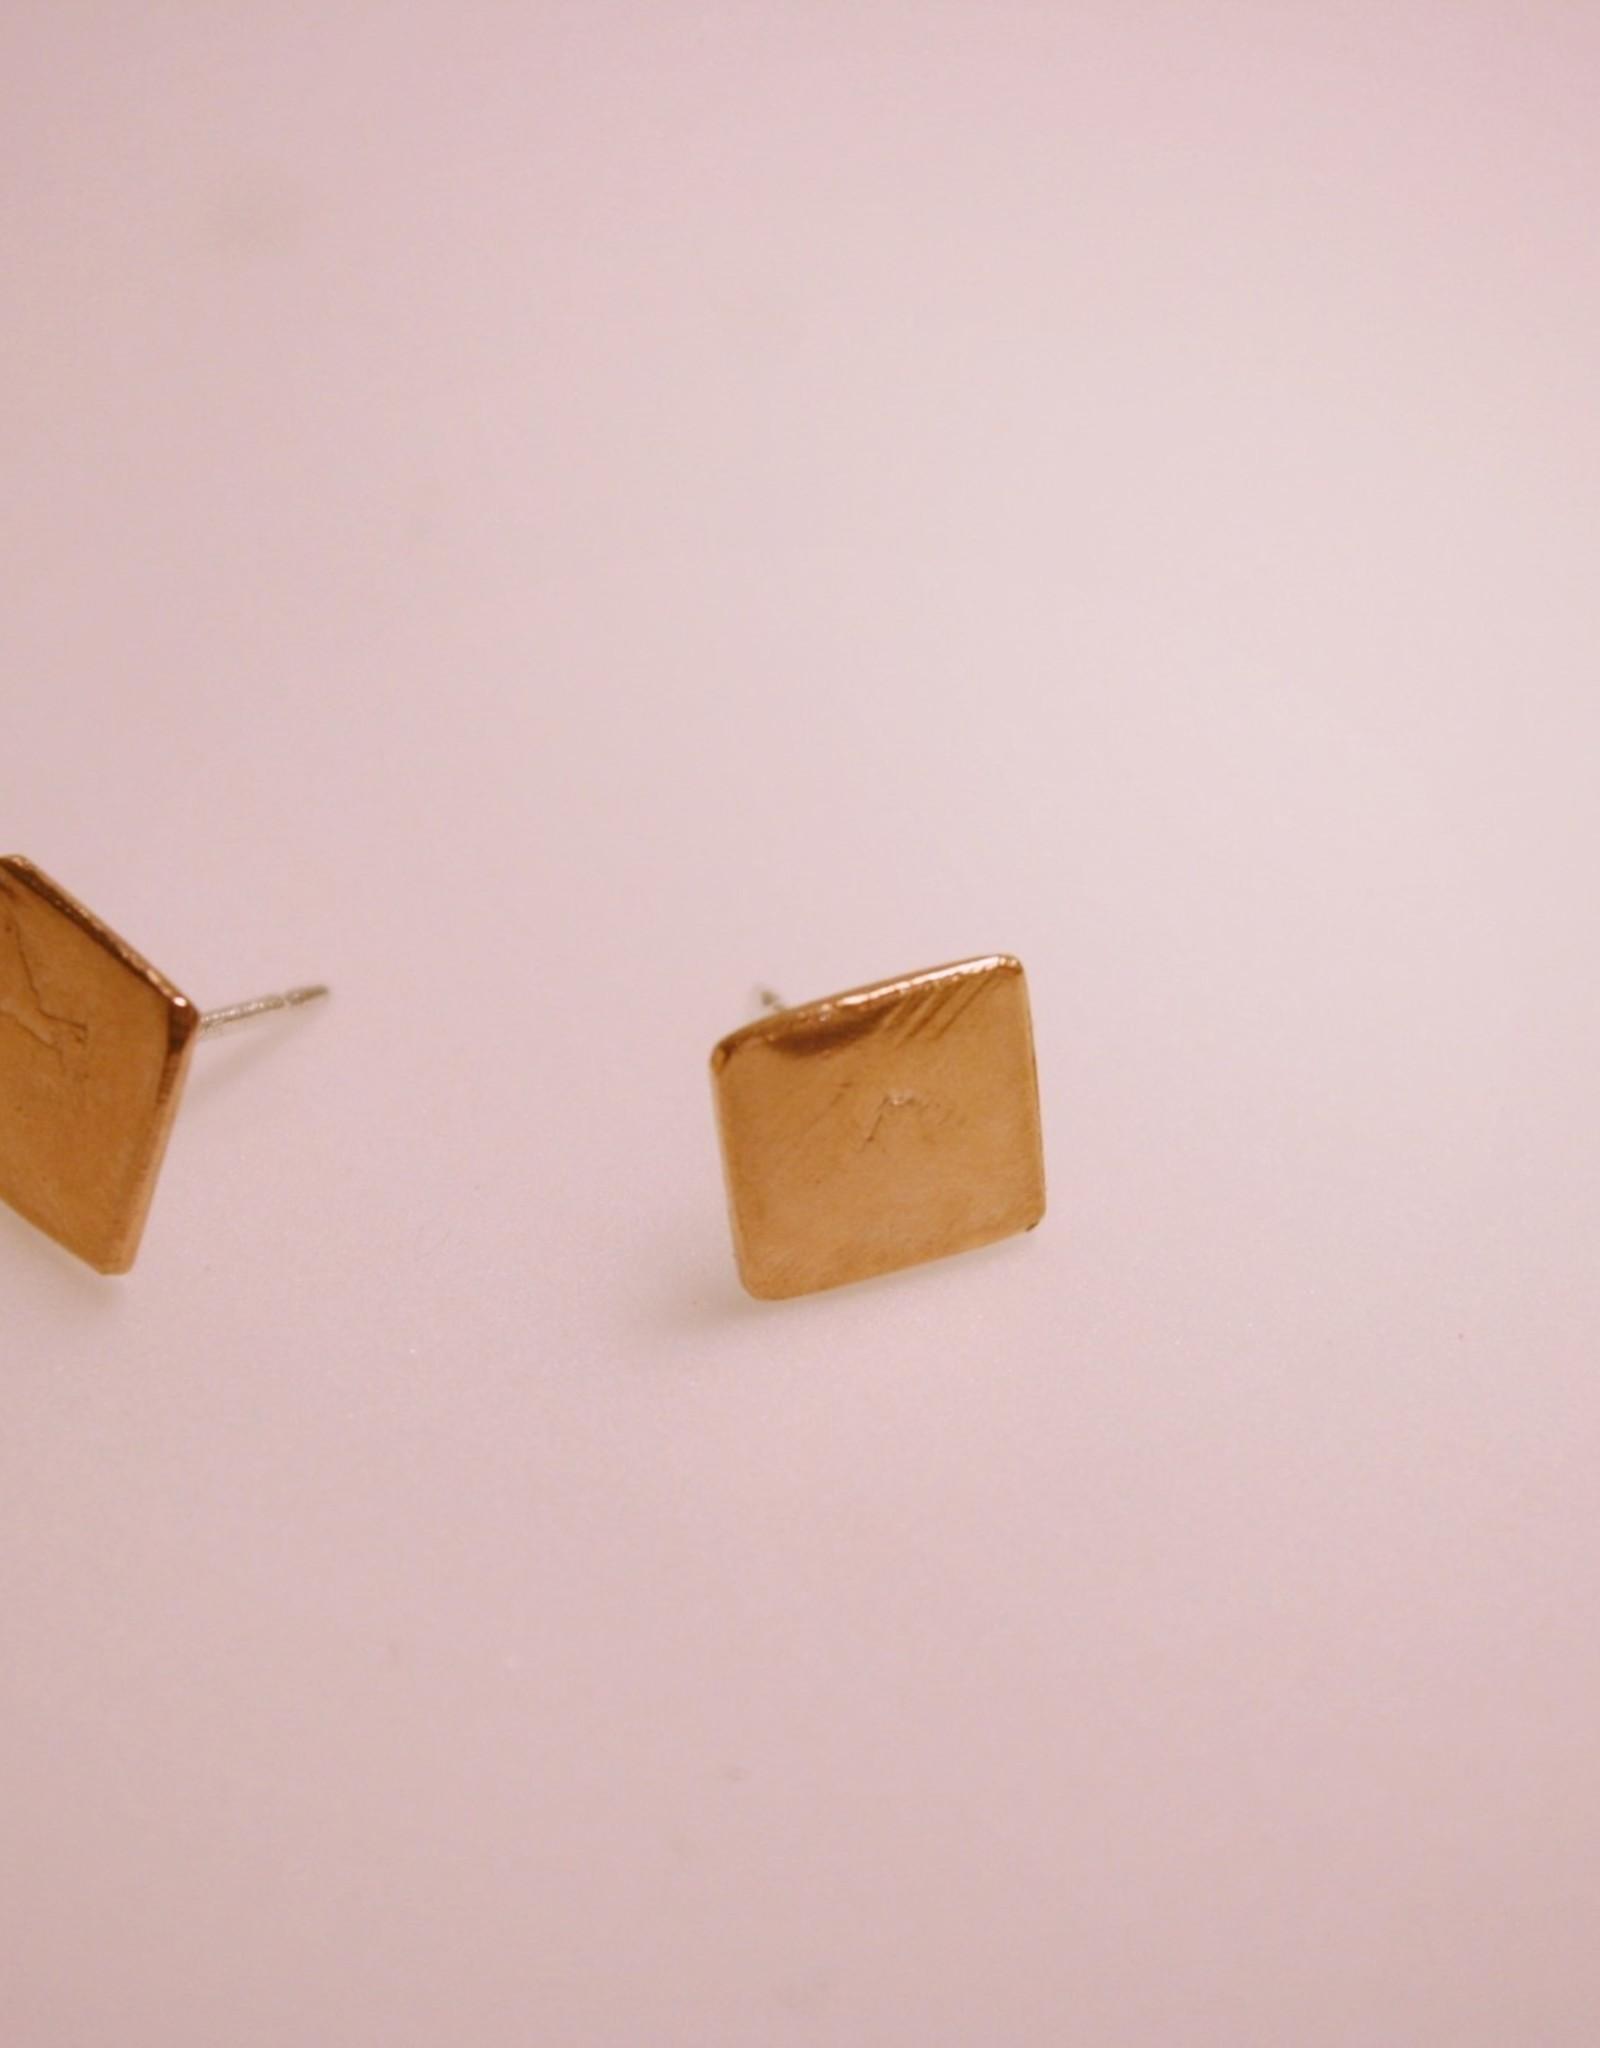 Copper Square Stud Earrings